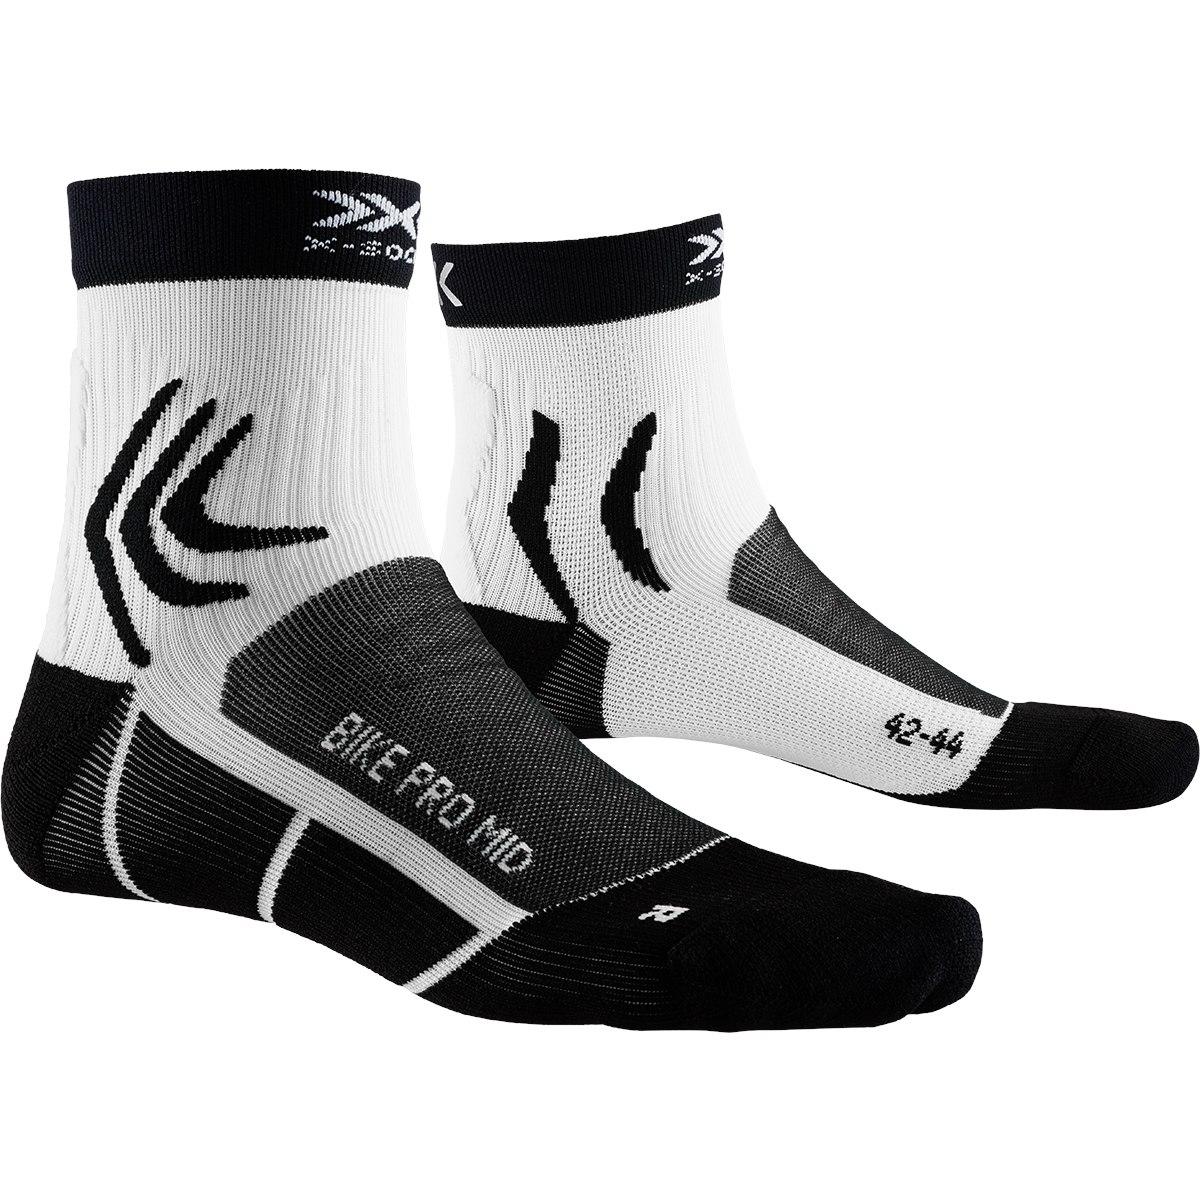 X-Socks Bike Pro Mid Socken - opal black/arctic white